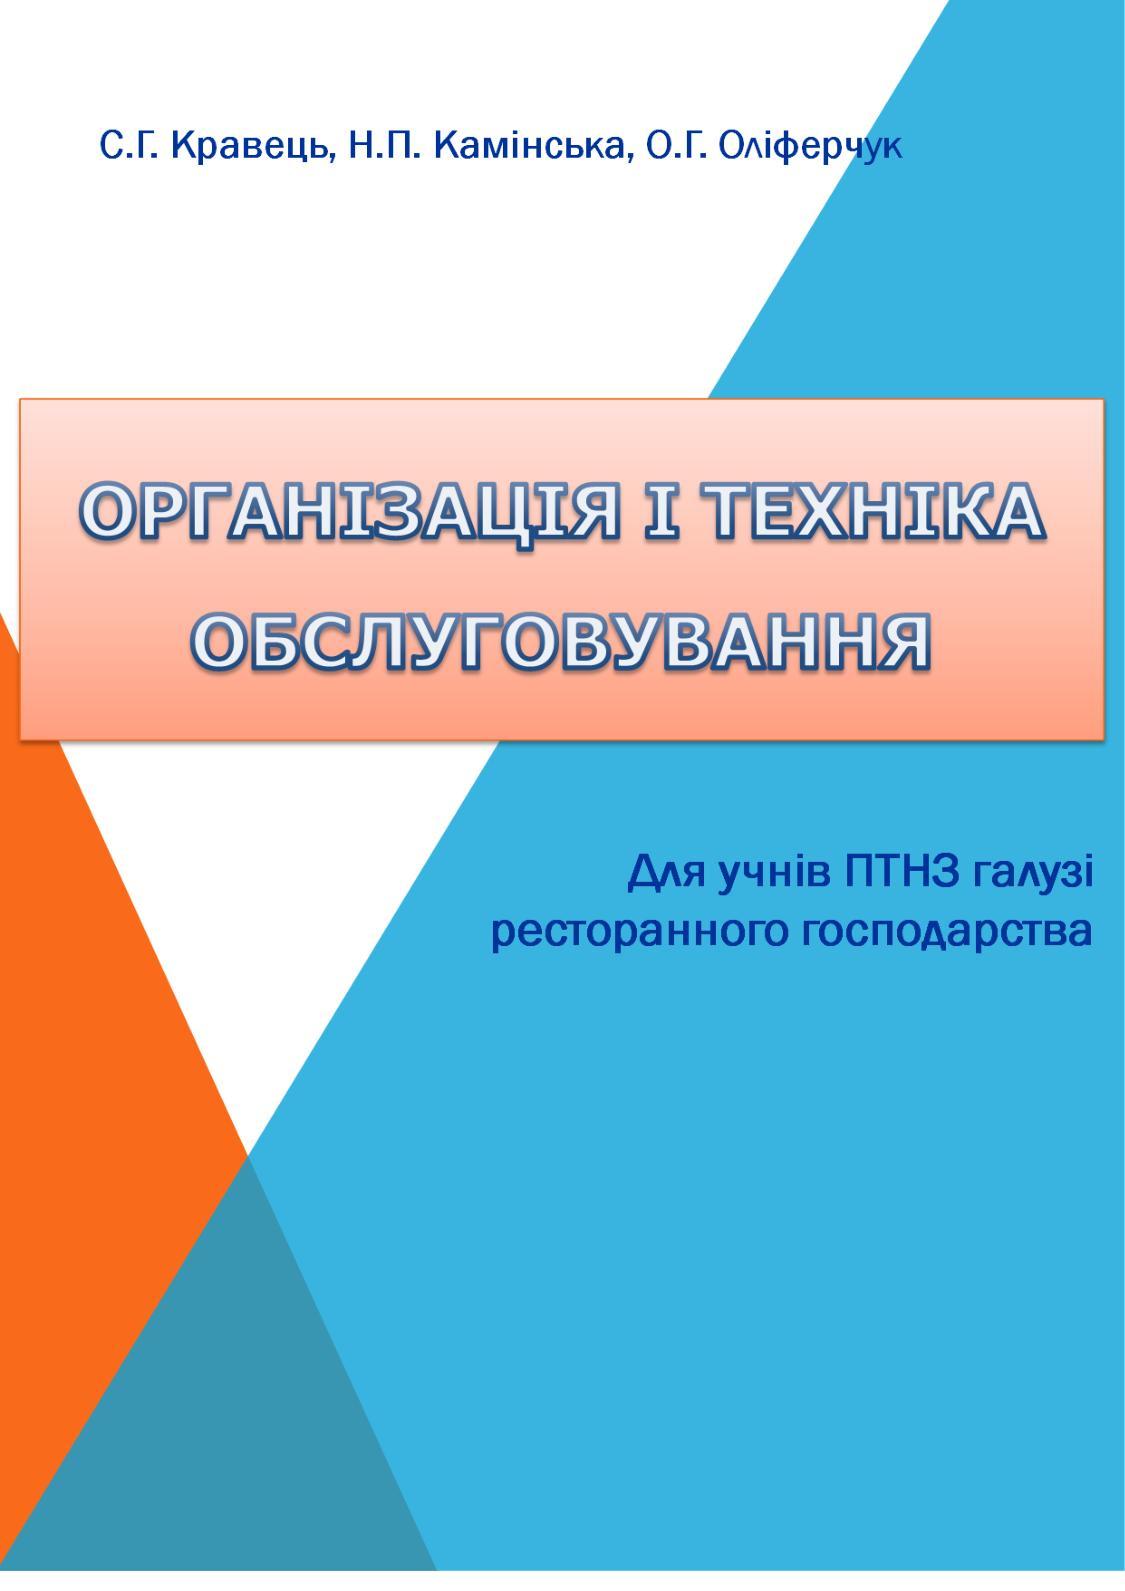 3b6d6db1e91045 Calaméo - Organizacia I Tehnika Obslugovuvannia 25012016 (1)